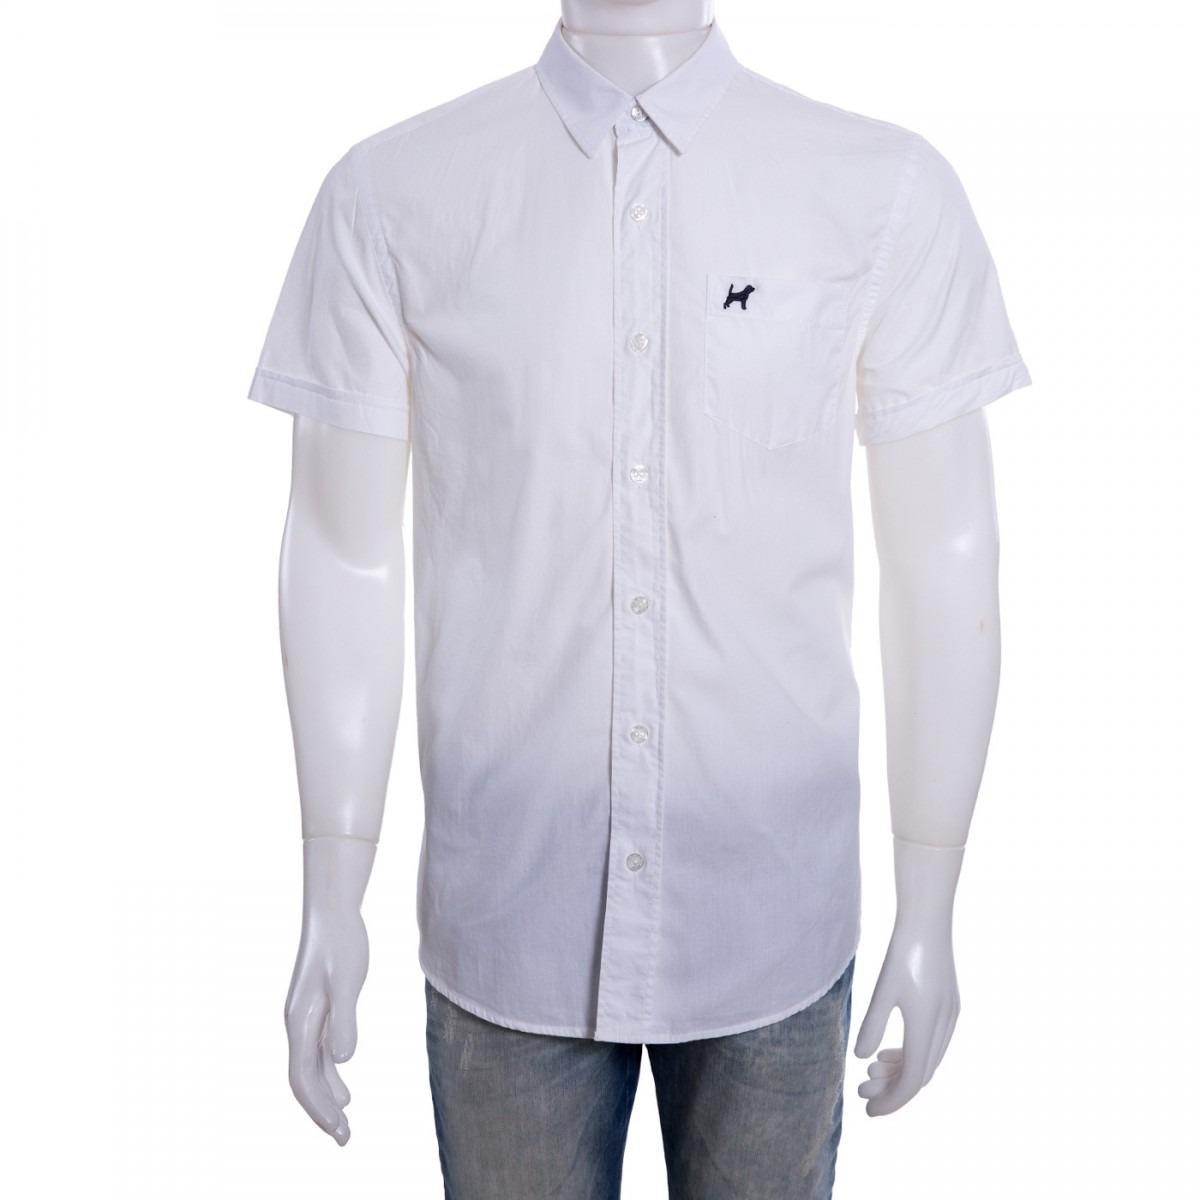 camisa social masculina beagle manga curta 027201 original. Carregando zoom. 7704c4193b8